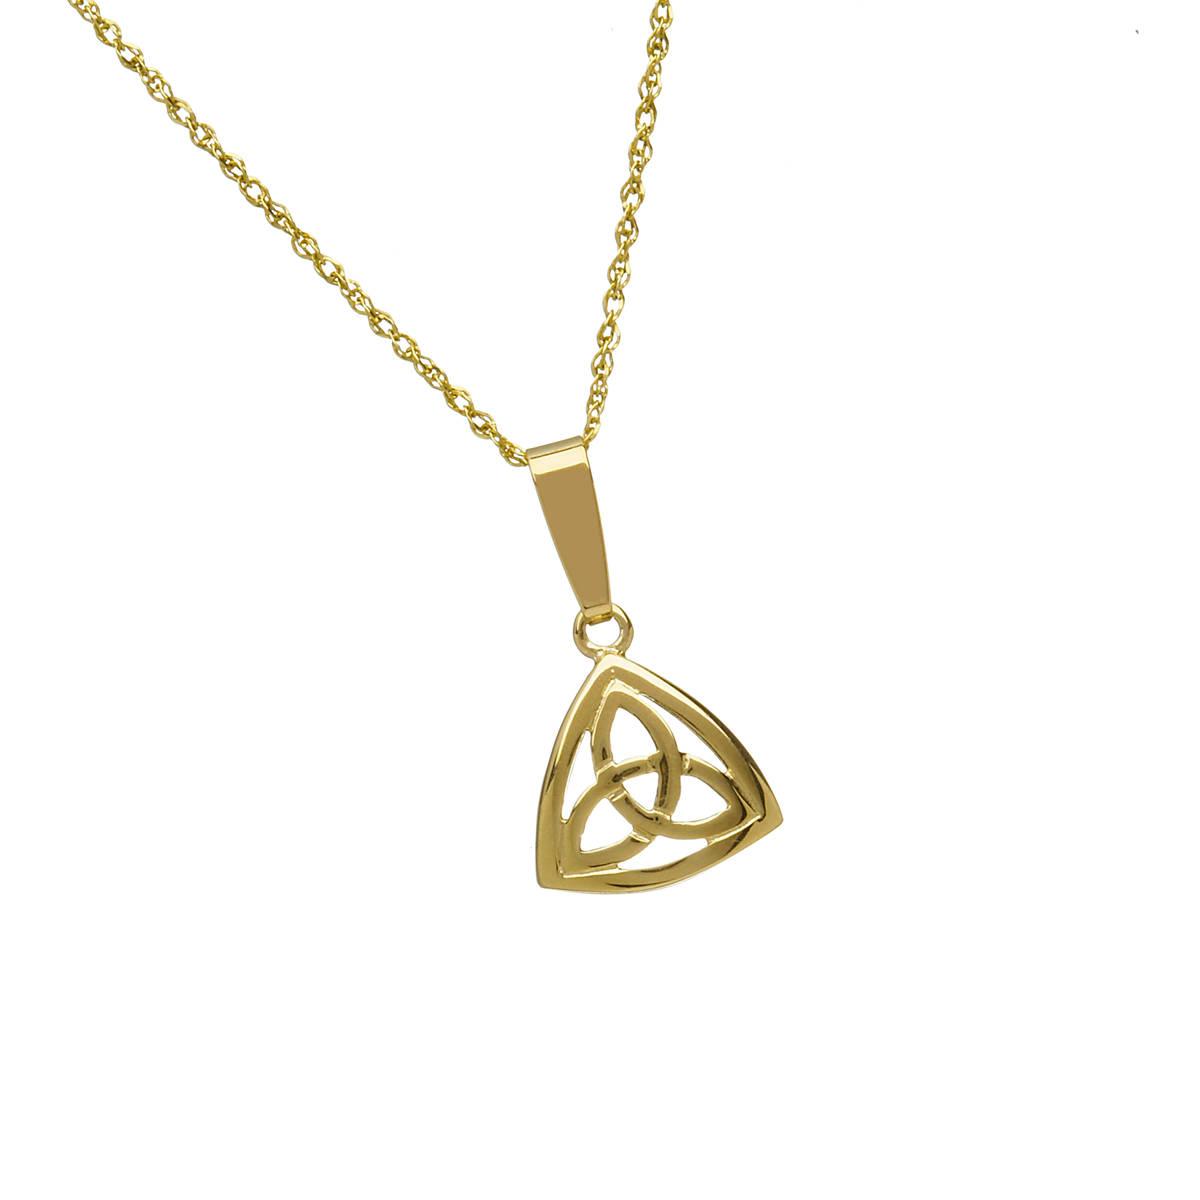 10 carat yellow gold trinity knot with bezel pendant.